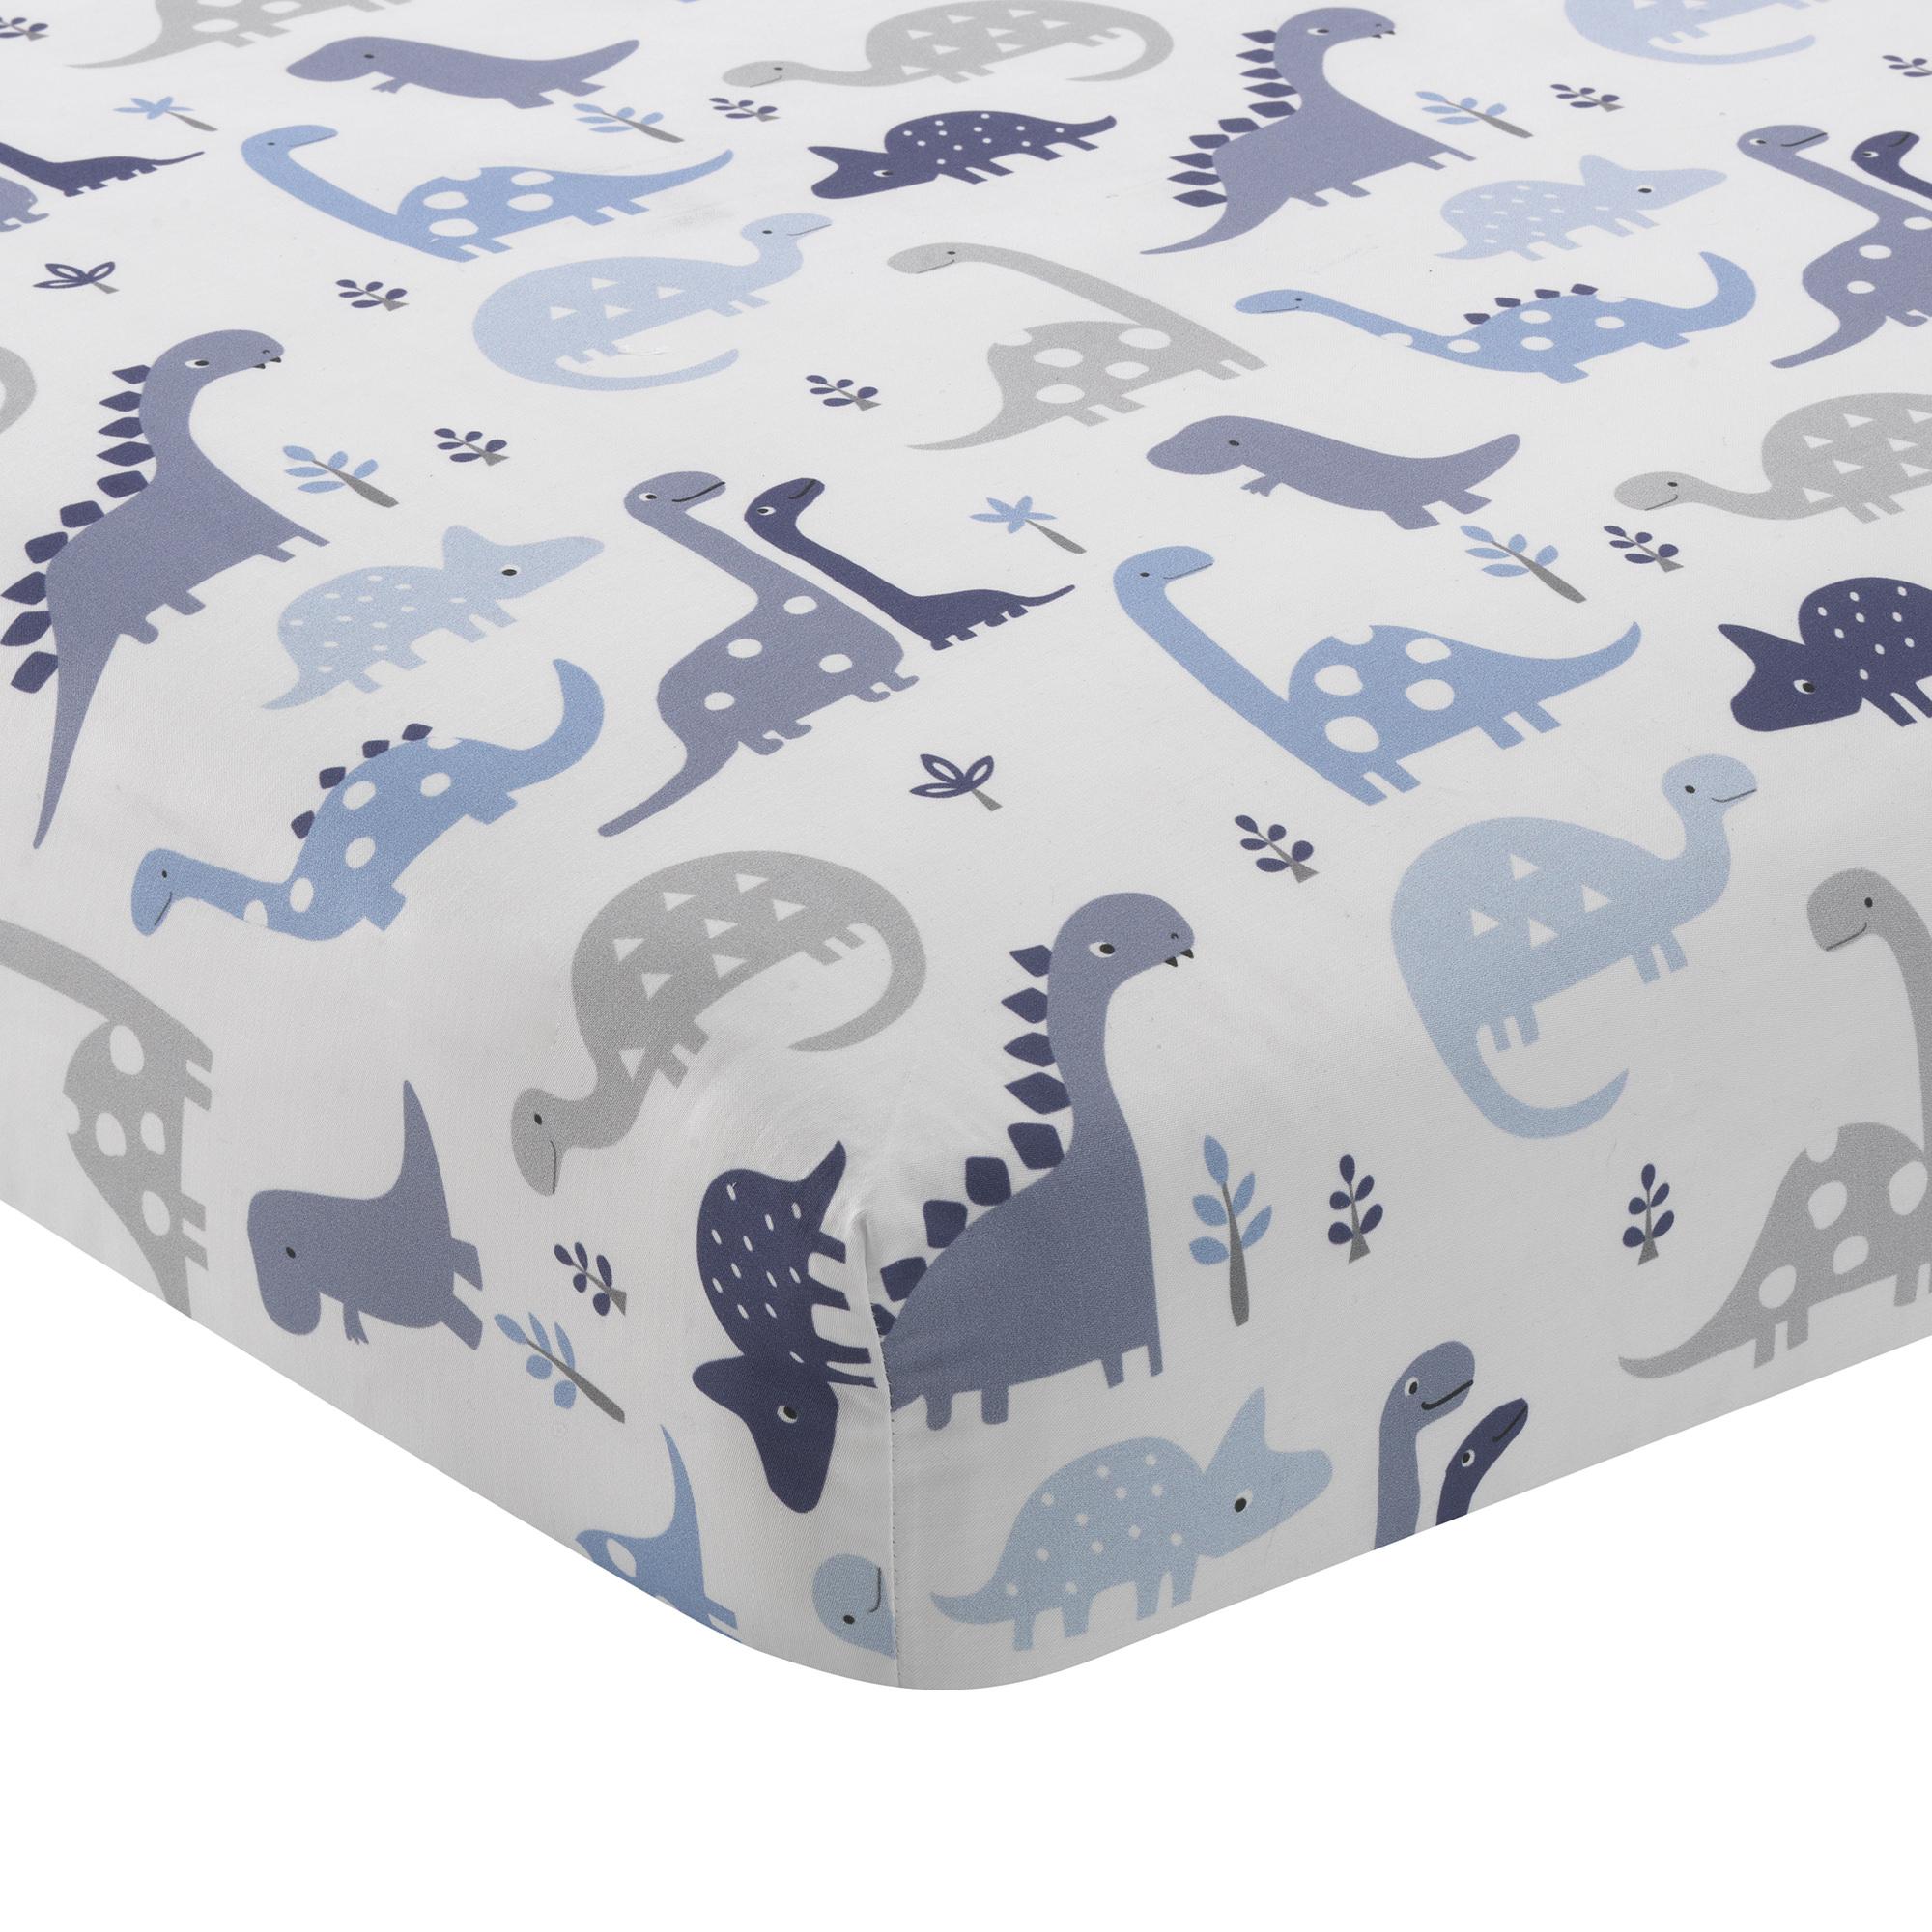 Bedtime Originals Roar Dinosaur 3 Piece Crib Bedding Set Throughout Recent Blended Fabric Mod Dinosaur 3 Piece Wall Hangings Set (View 13 of 20)